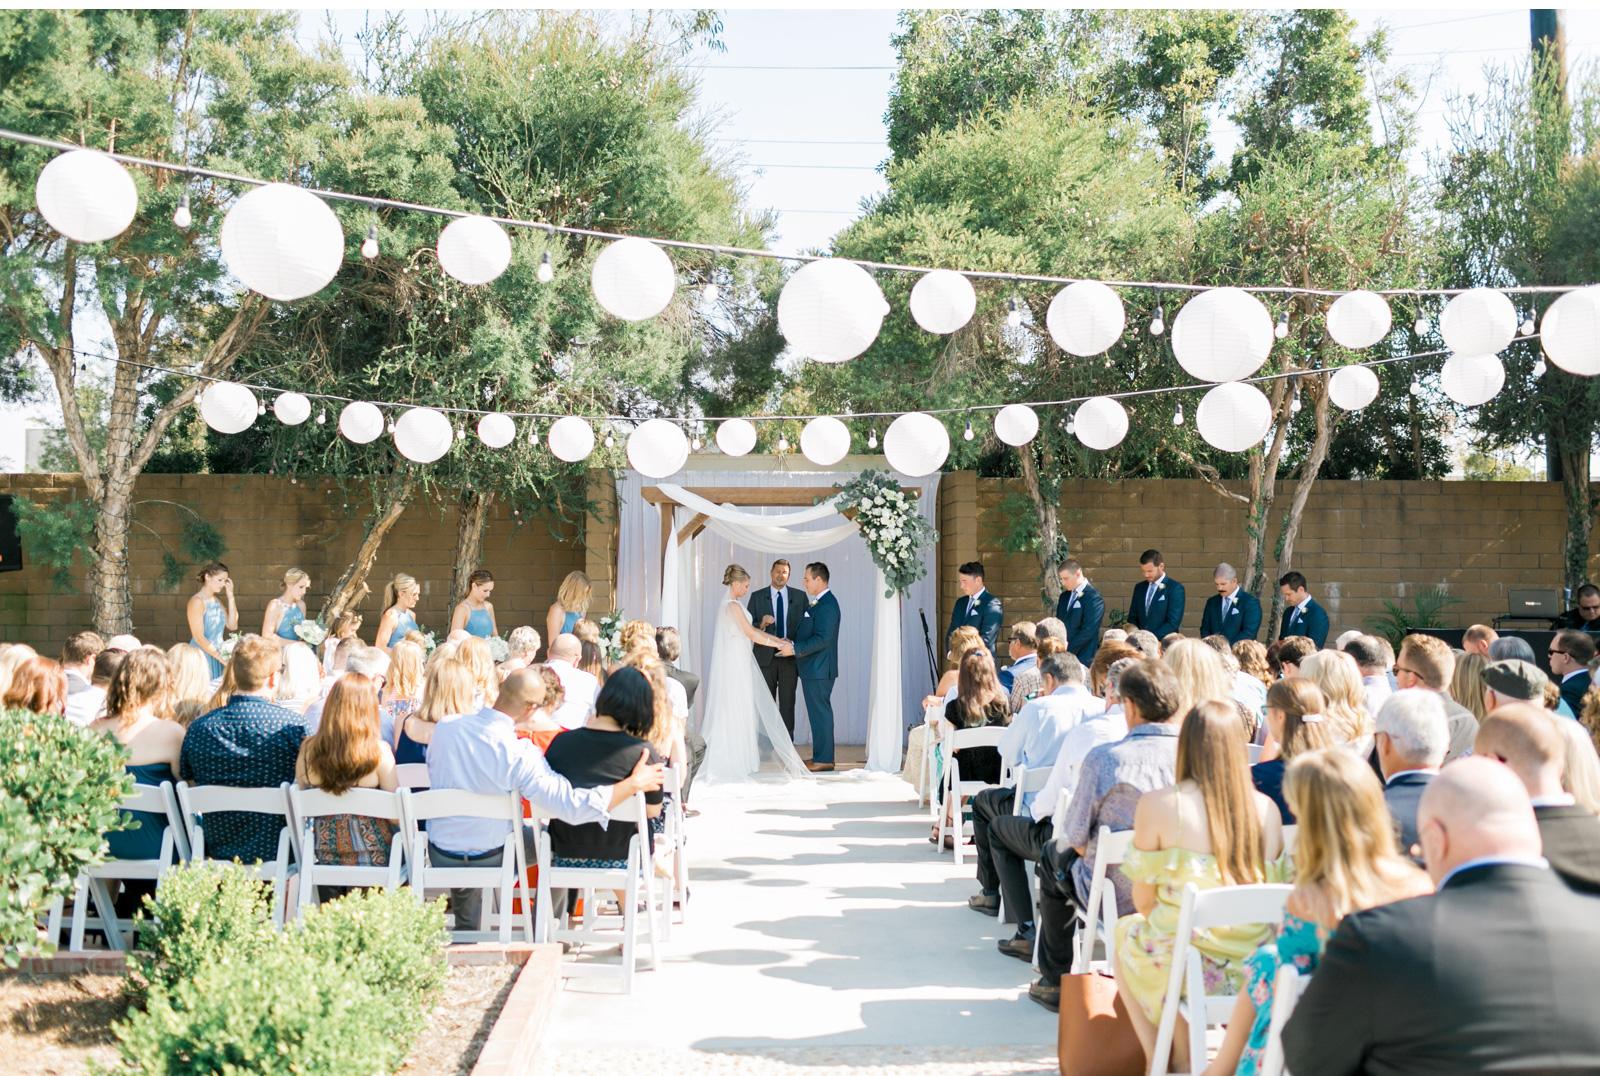 San-Luis-Obispo-Wedding-Photographer-Natalie-Schutt-Photography-Style-Me-Pretty_14.jpg